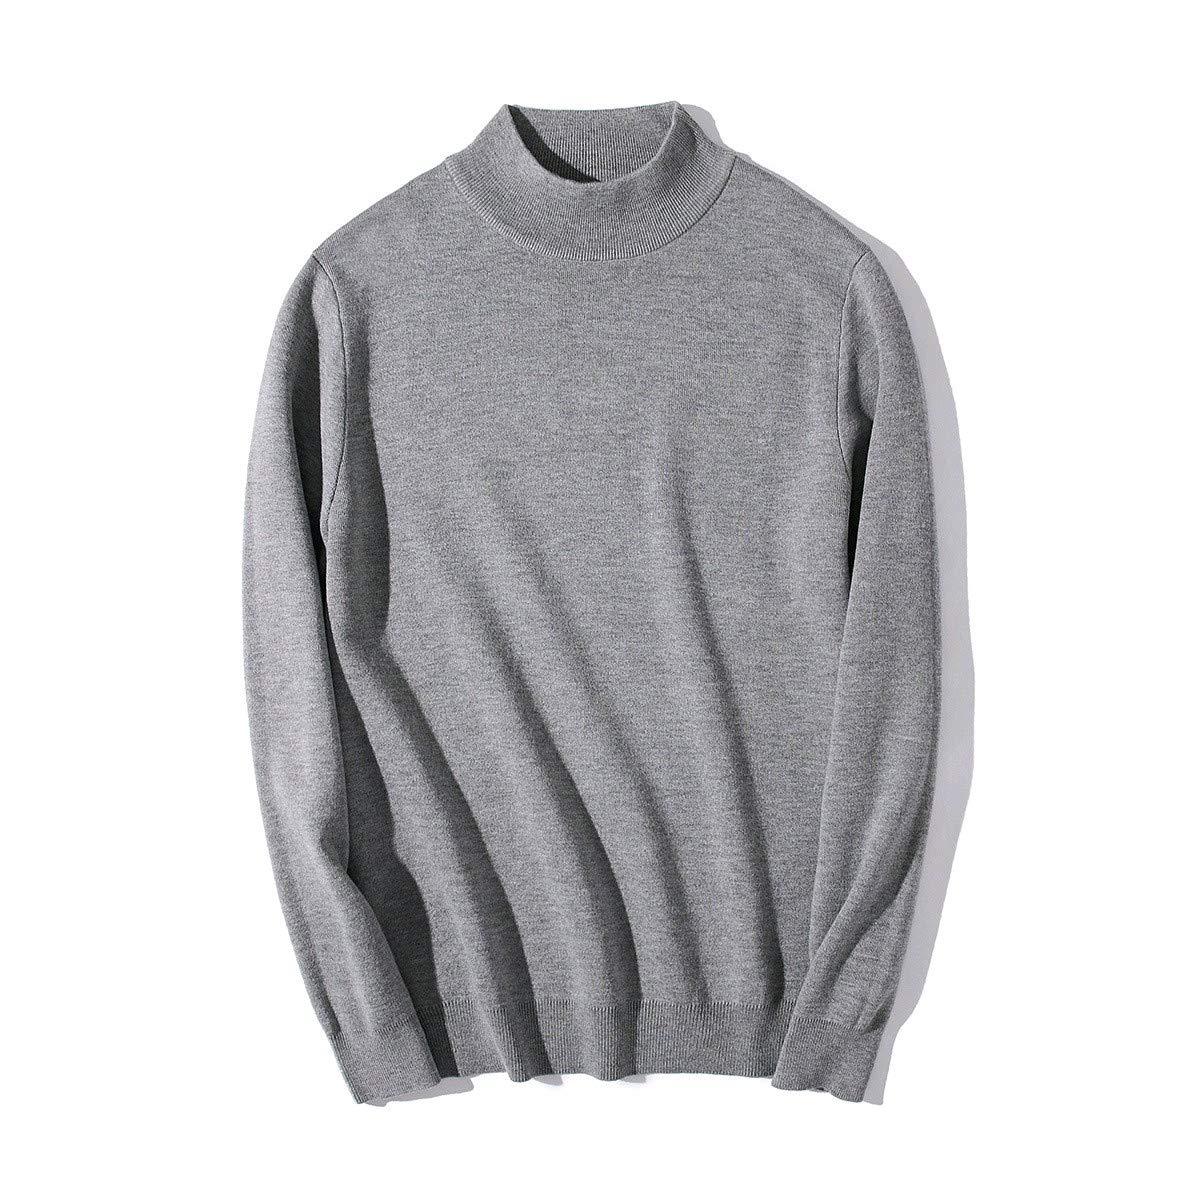 YUNY Men Turtleneck Pullover Oversize Colortone Pullover Sweater 6 S